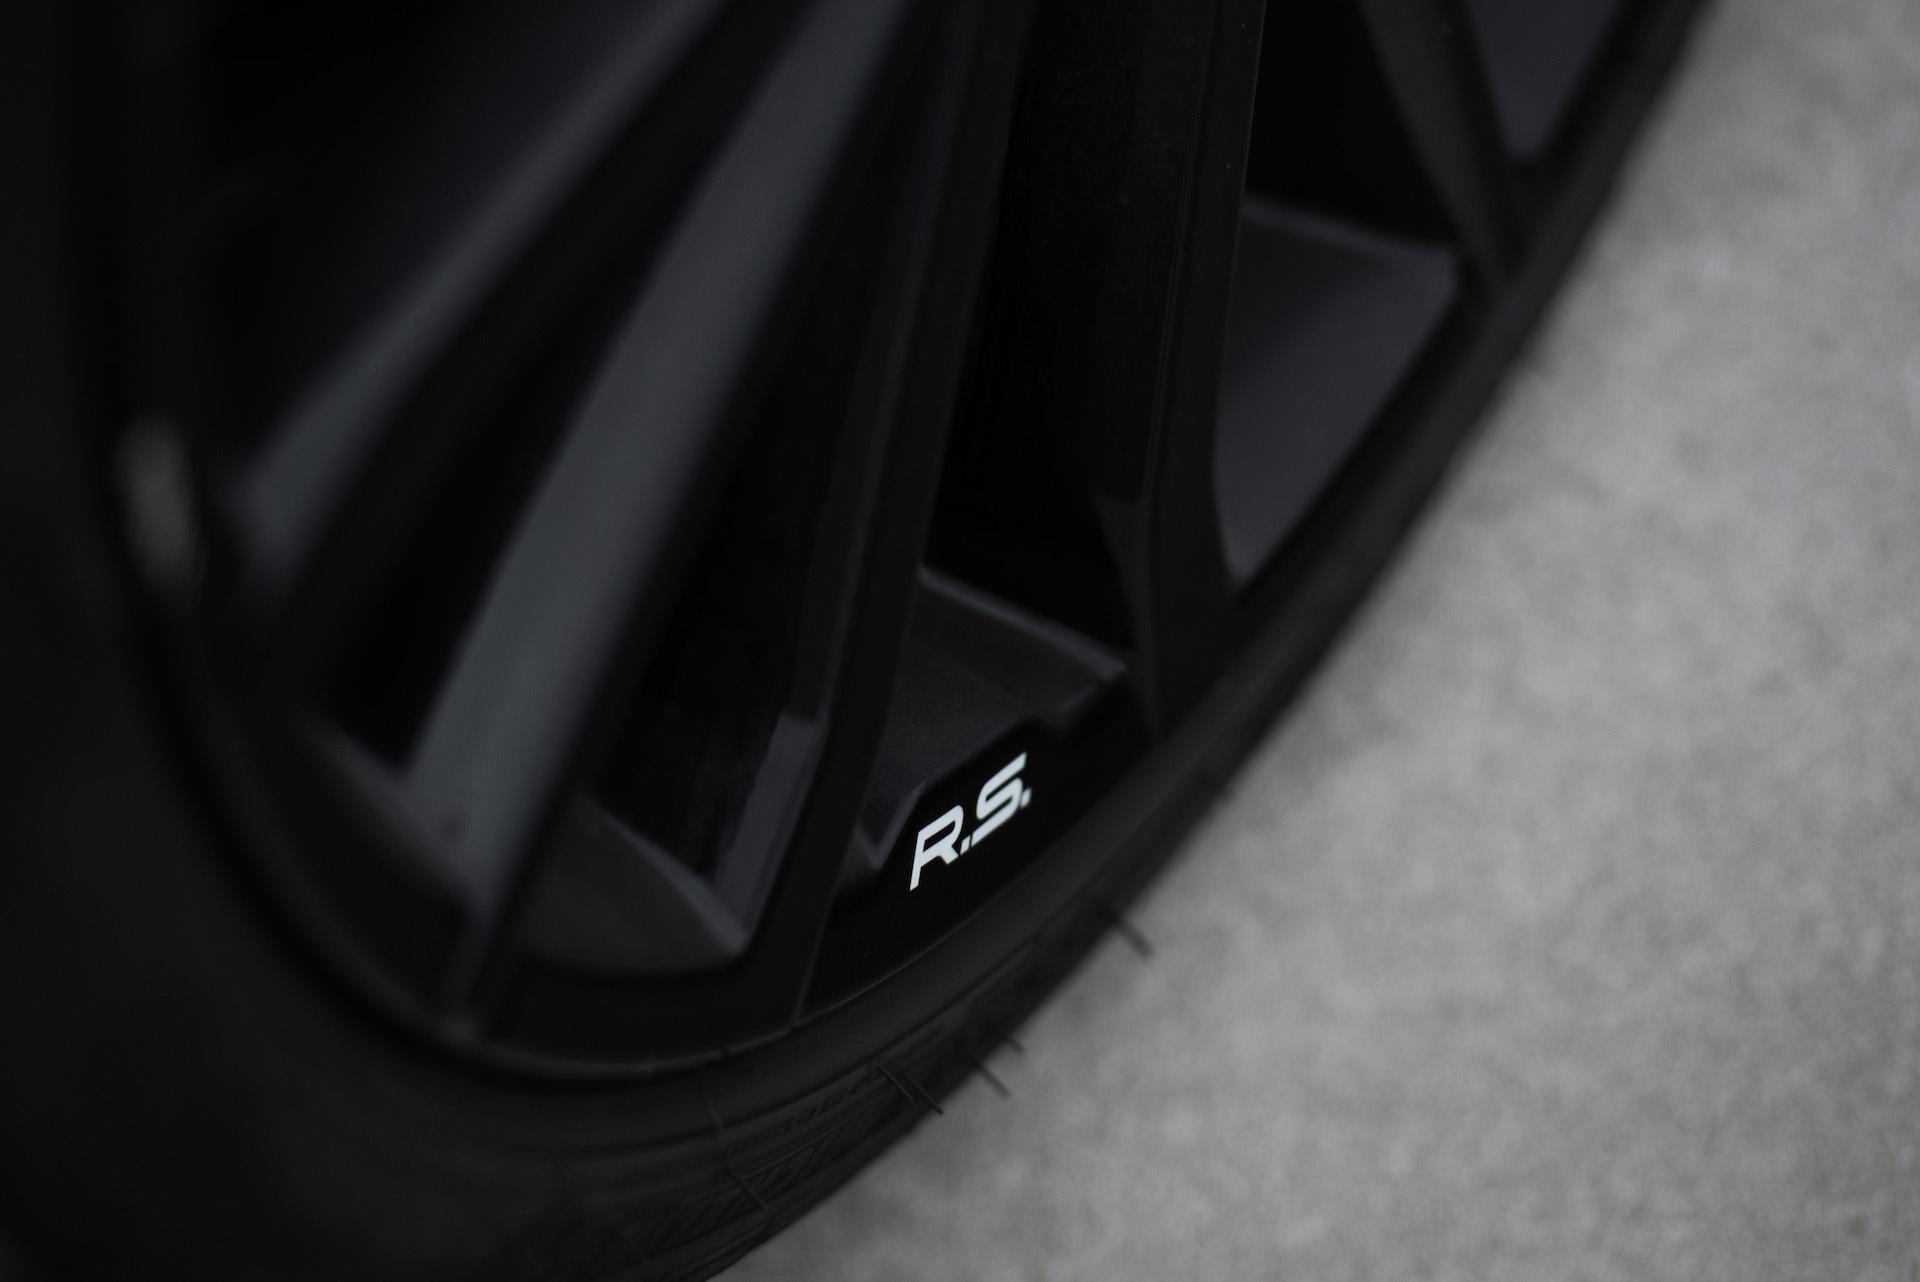 Renault_Clio_RS_2